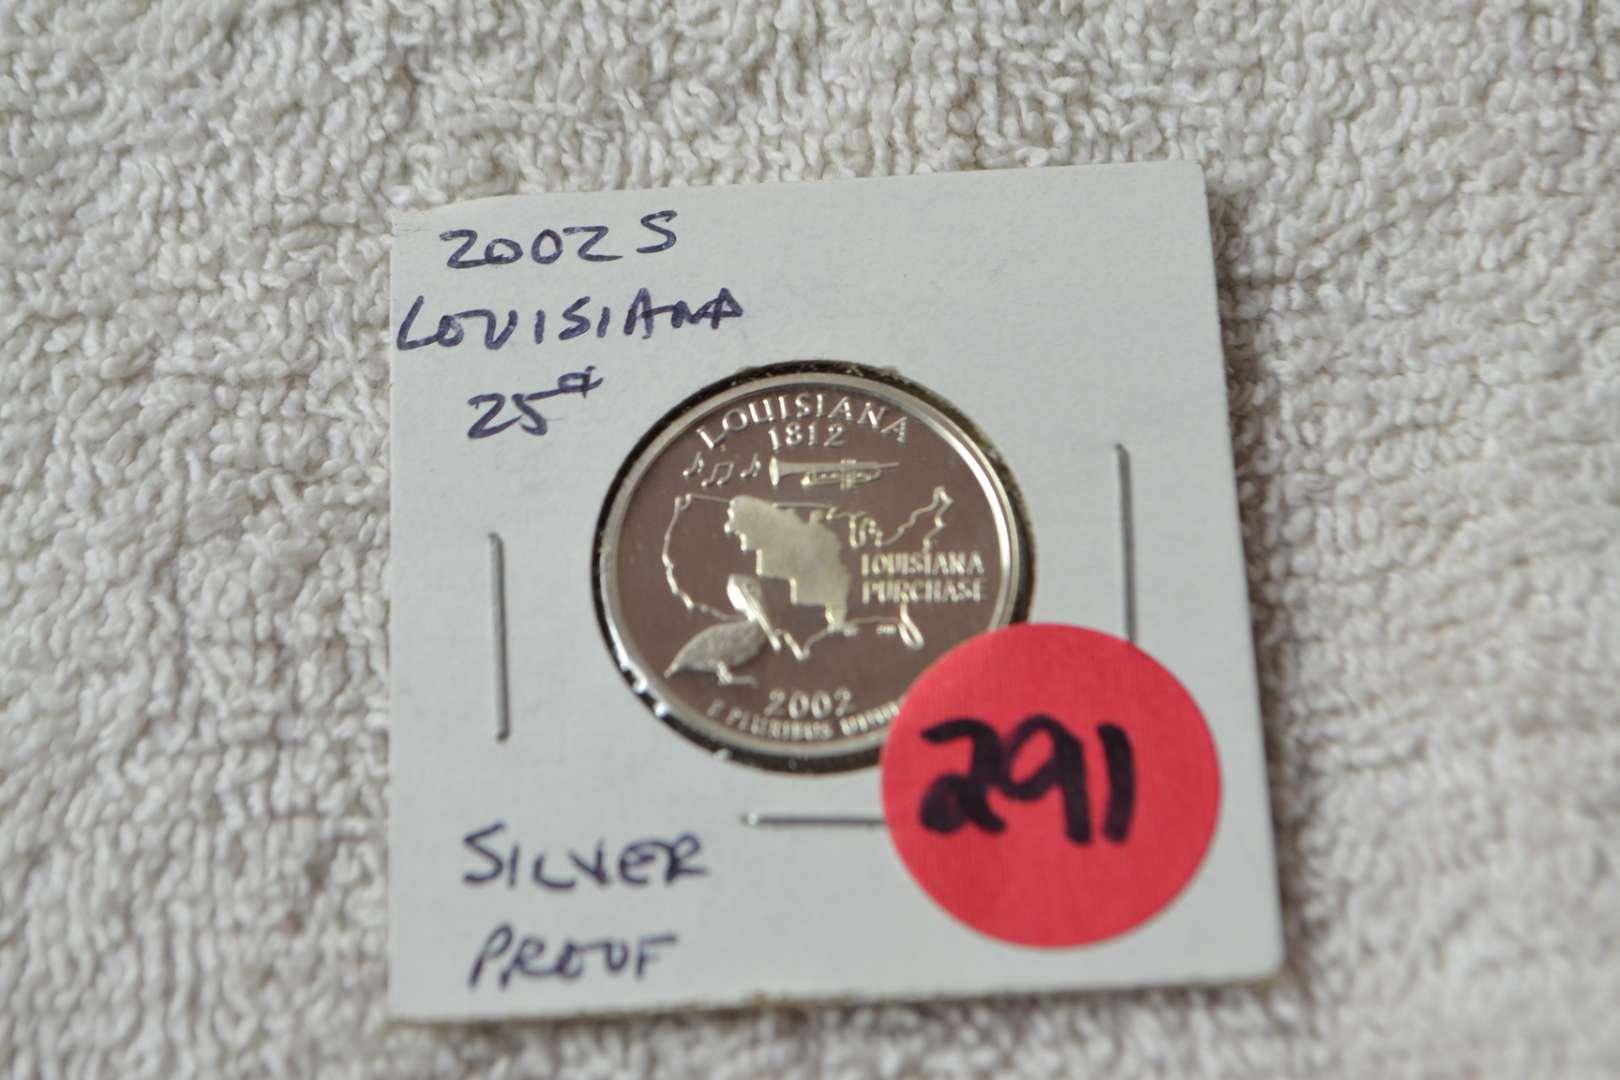 Lot # 291 2002-S SILVER PROOF QUARTER LOUISIANA